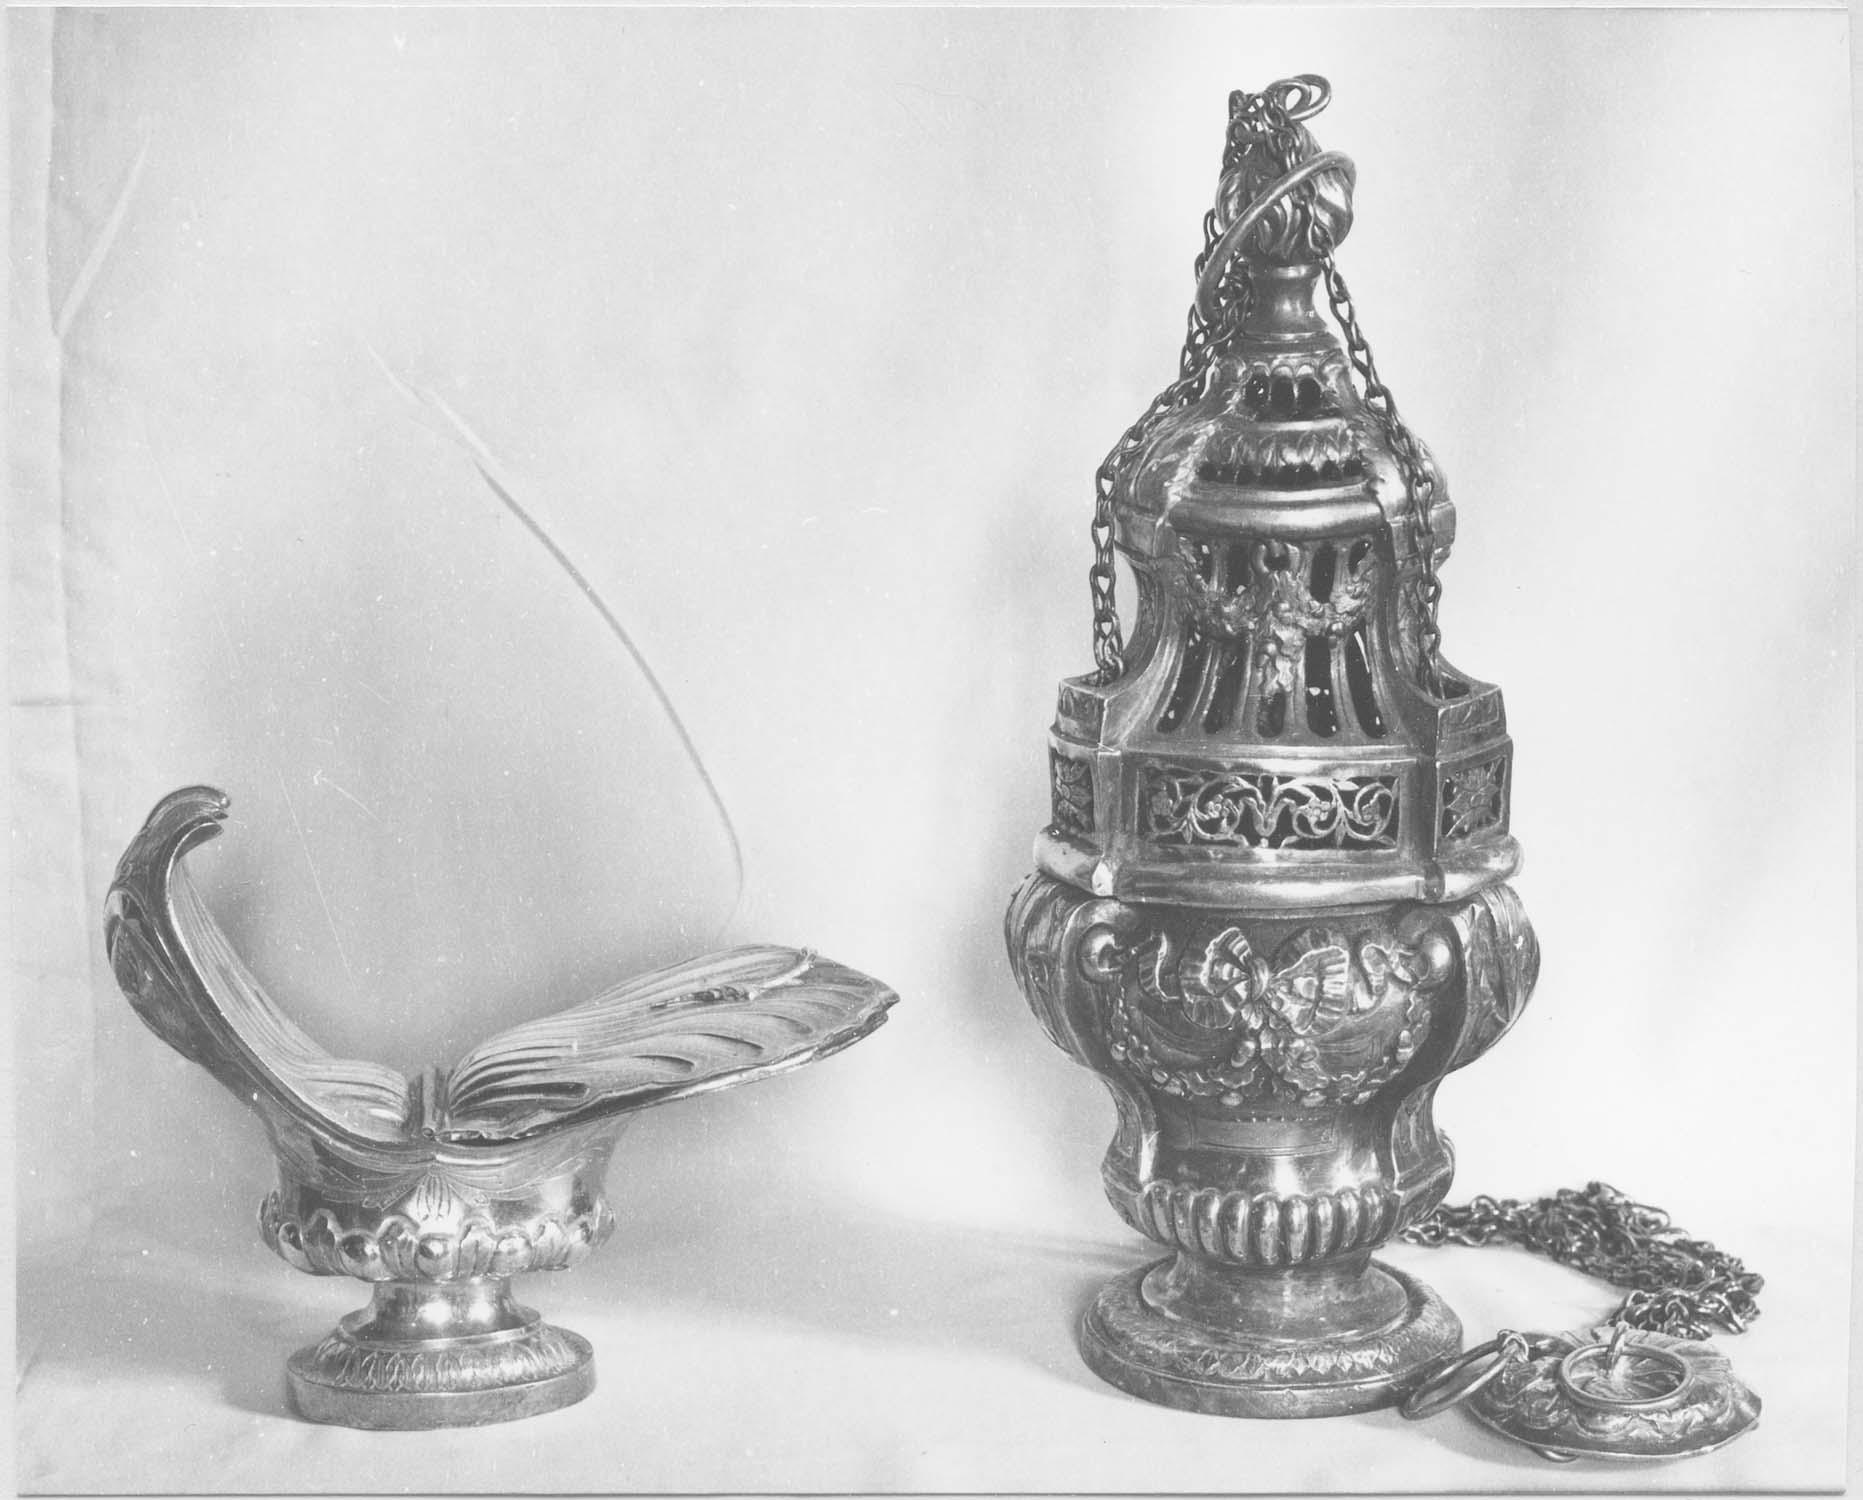 encensoir, navette et cuiller à encens